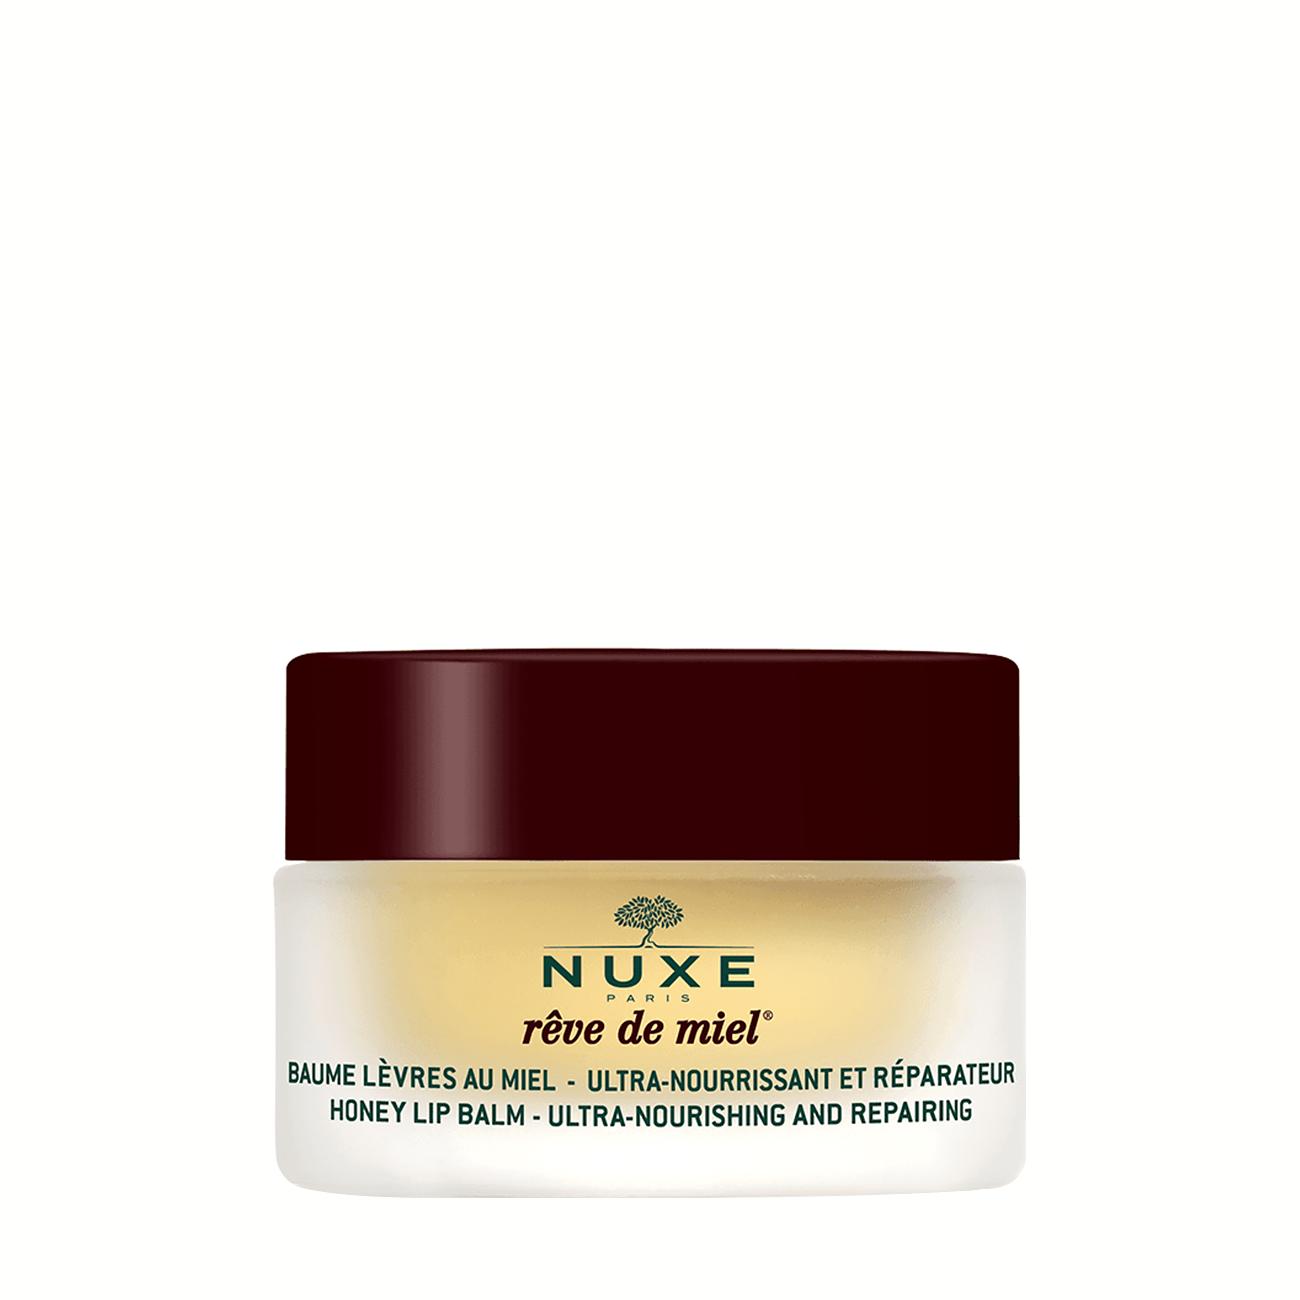 Reve De Miel- Honey Lip Balm 15gr Nuxe imagine 2021 bestvalue.eu